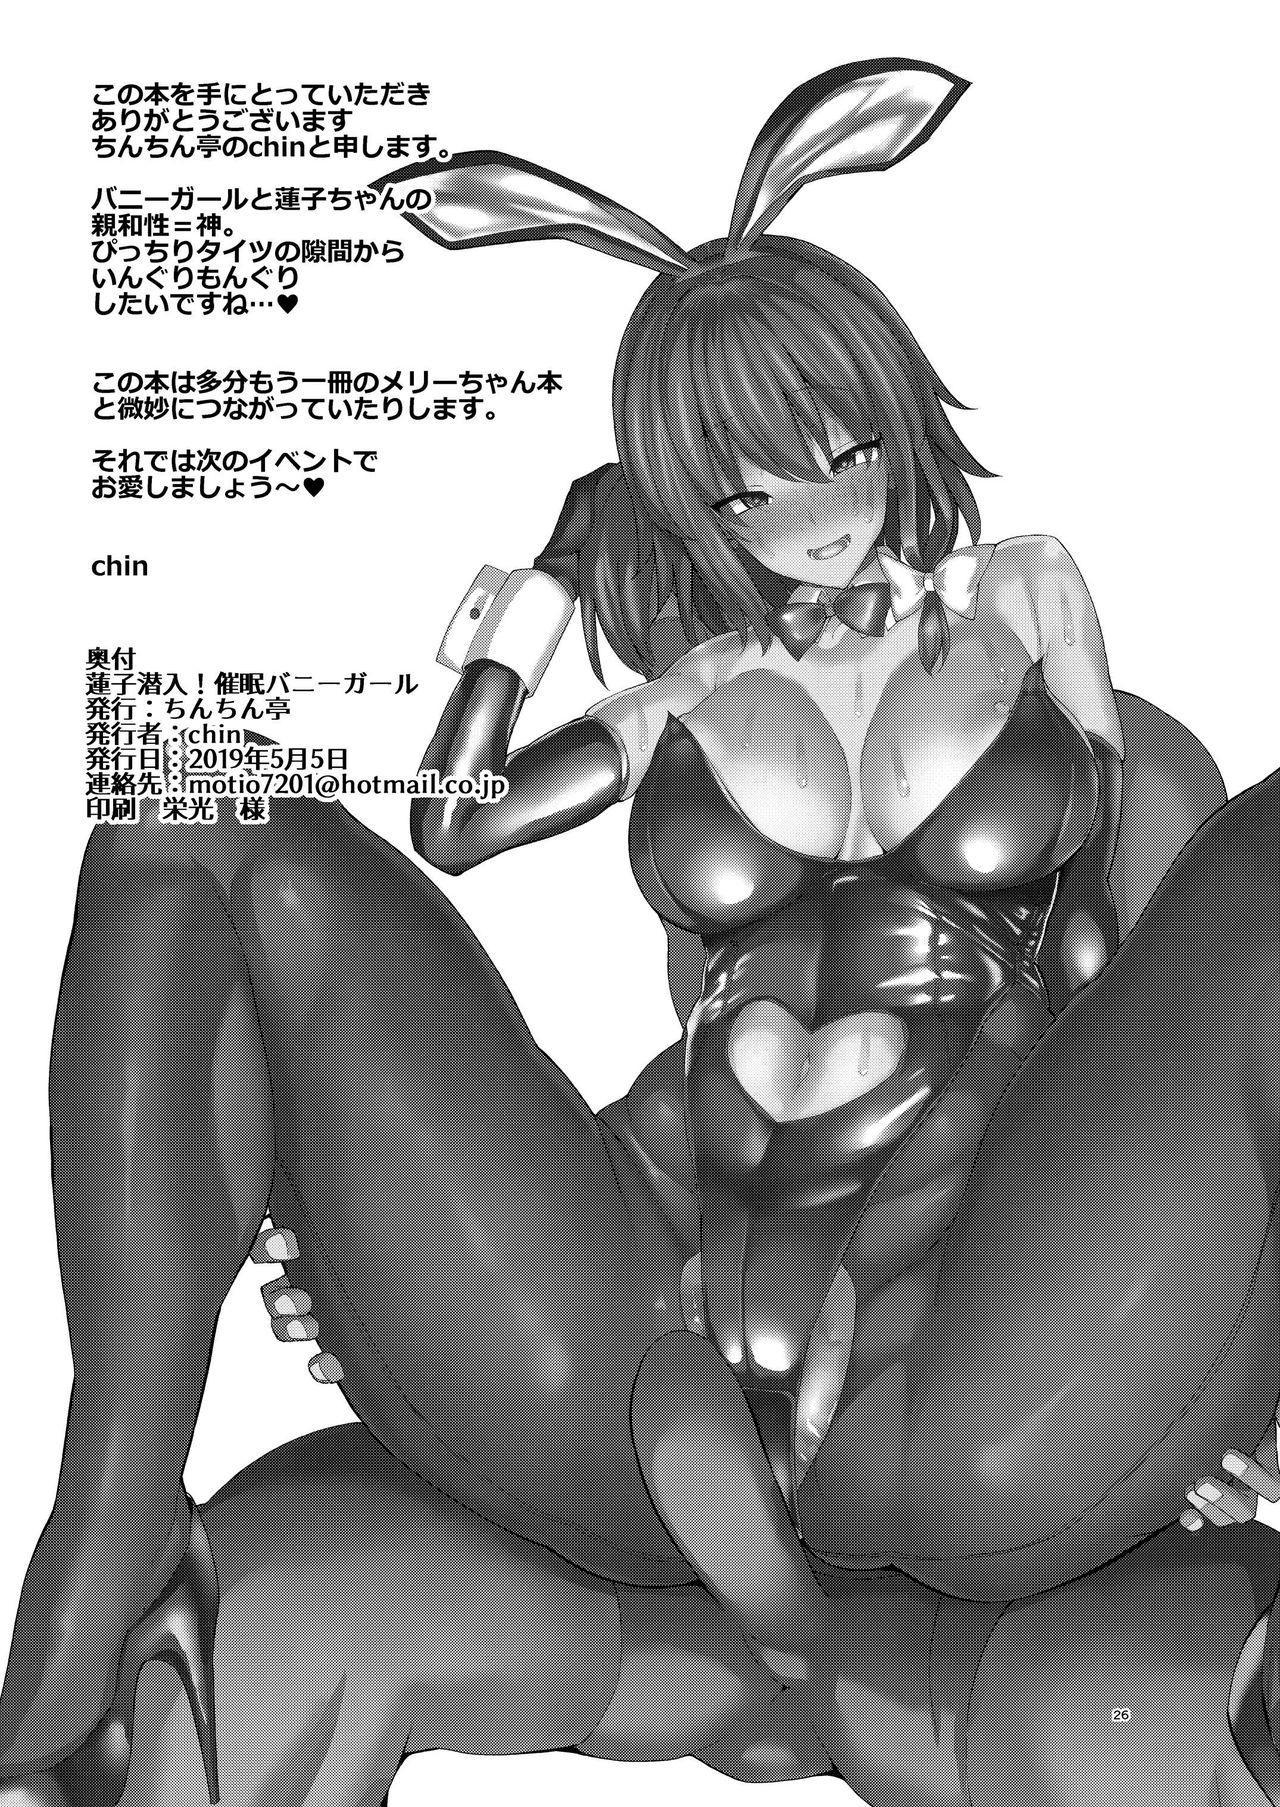 Renko Sennyuu! Saimin Bunny Girl 27